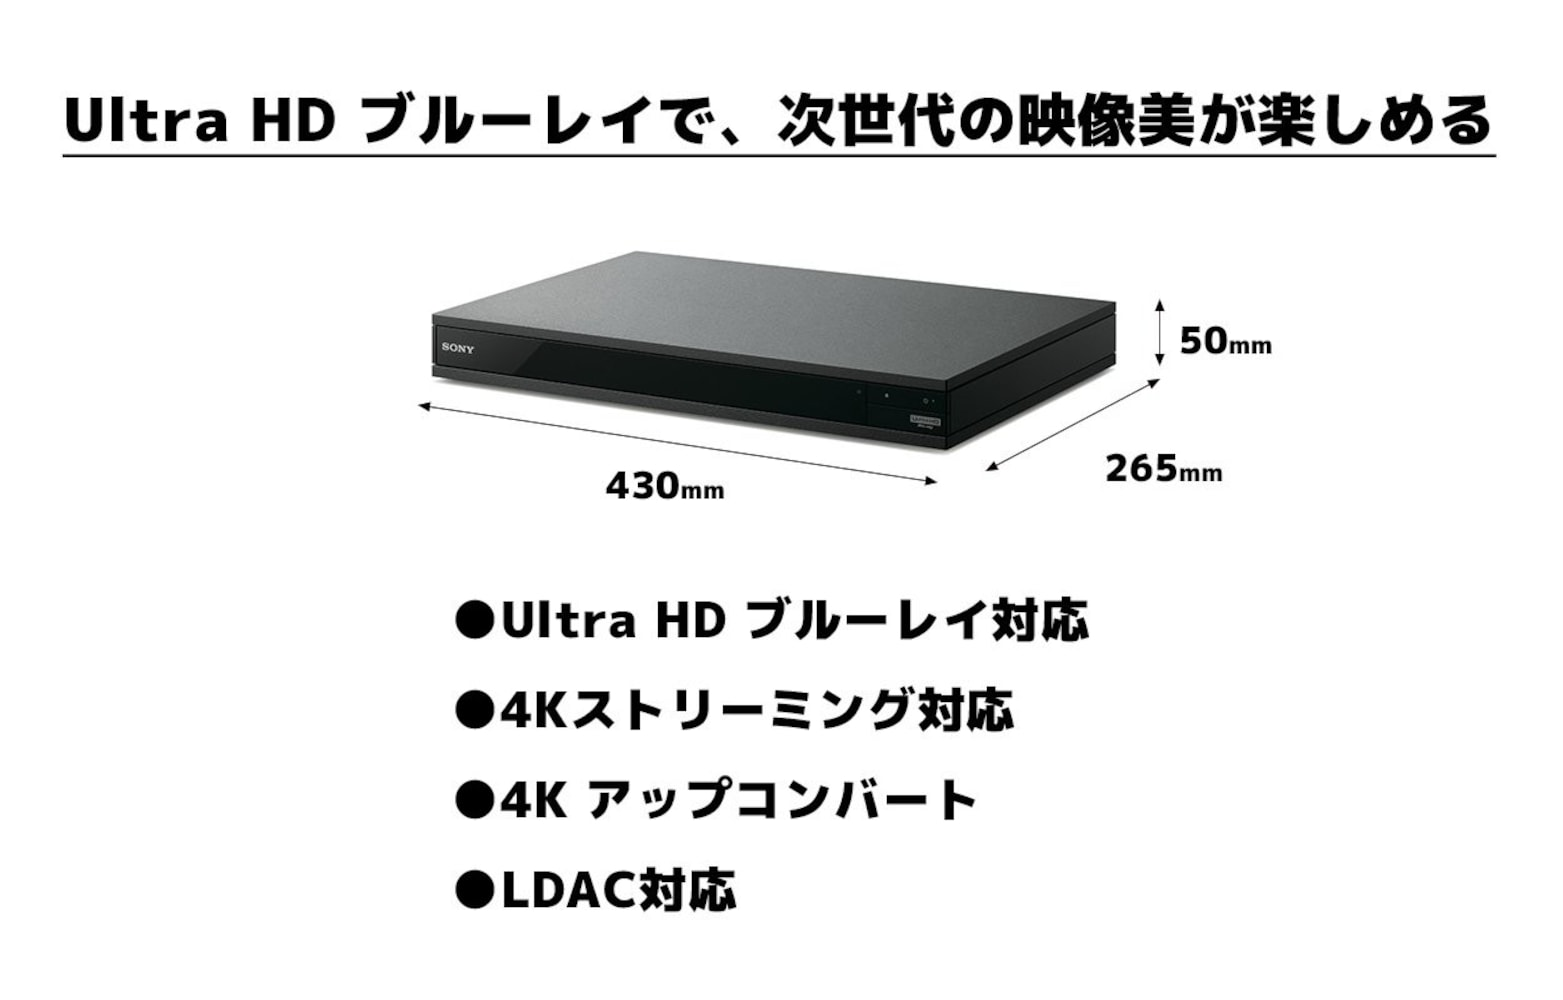 「Ultra HD Blu-ray」はブルーレイの4倍の解像度